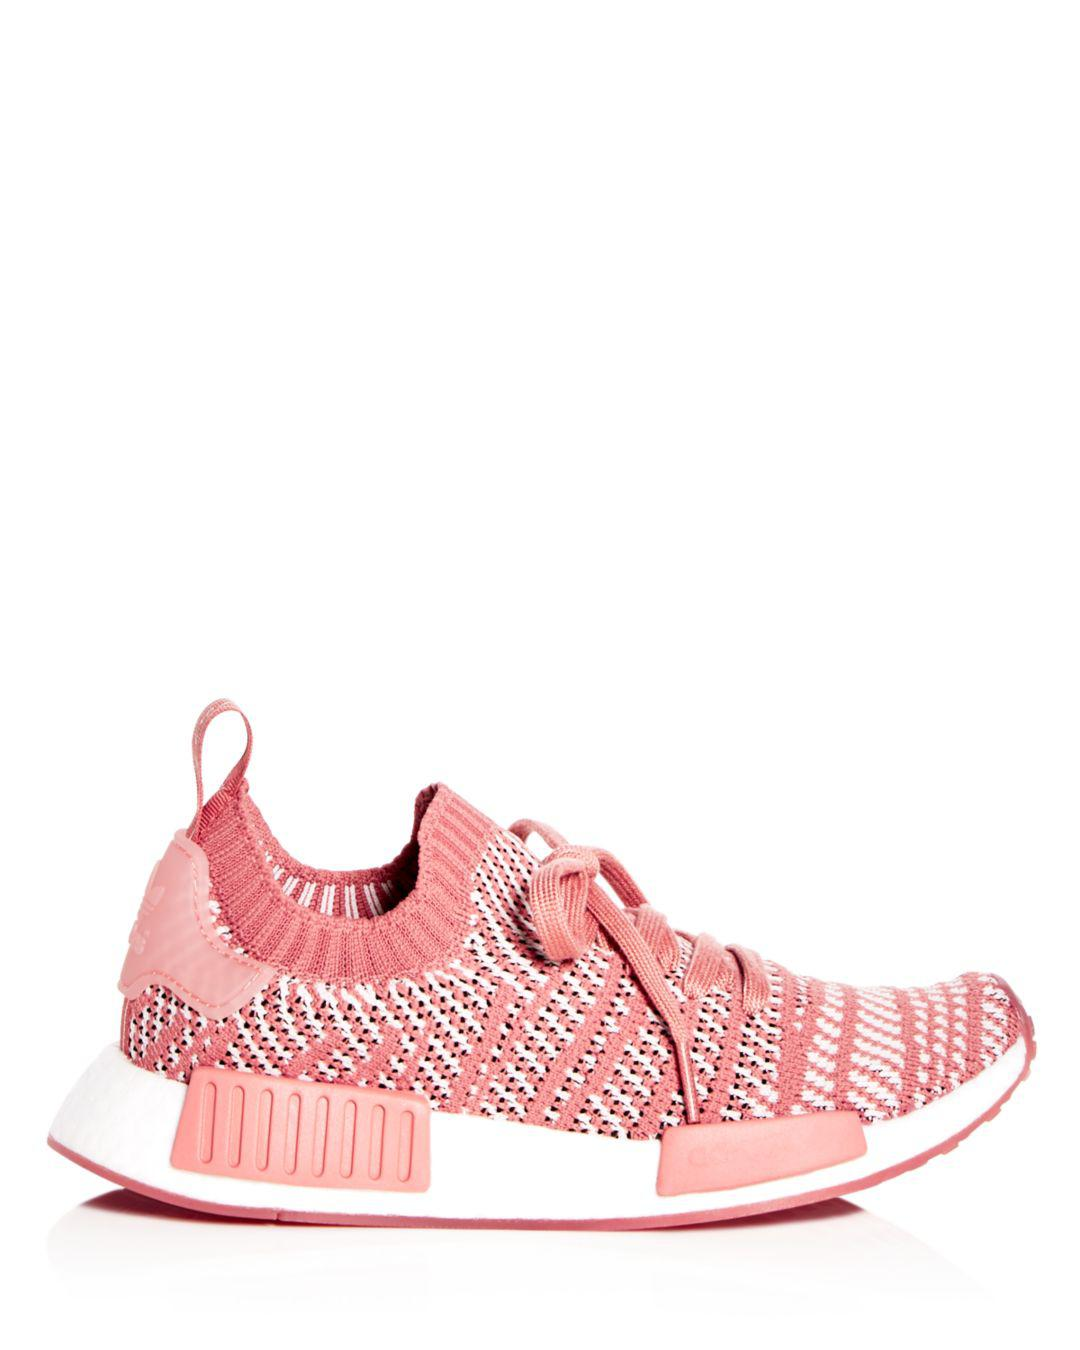 d95cc35f8e0c Lyst - adidas Women s Nmd R1 Knit Lace Up Sneakers in Pink